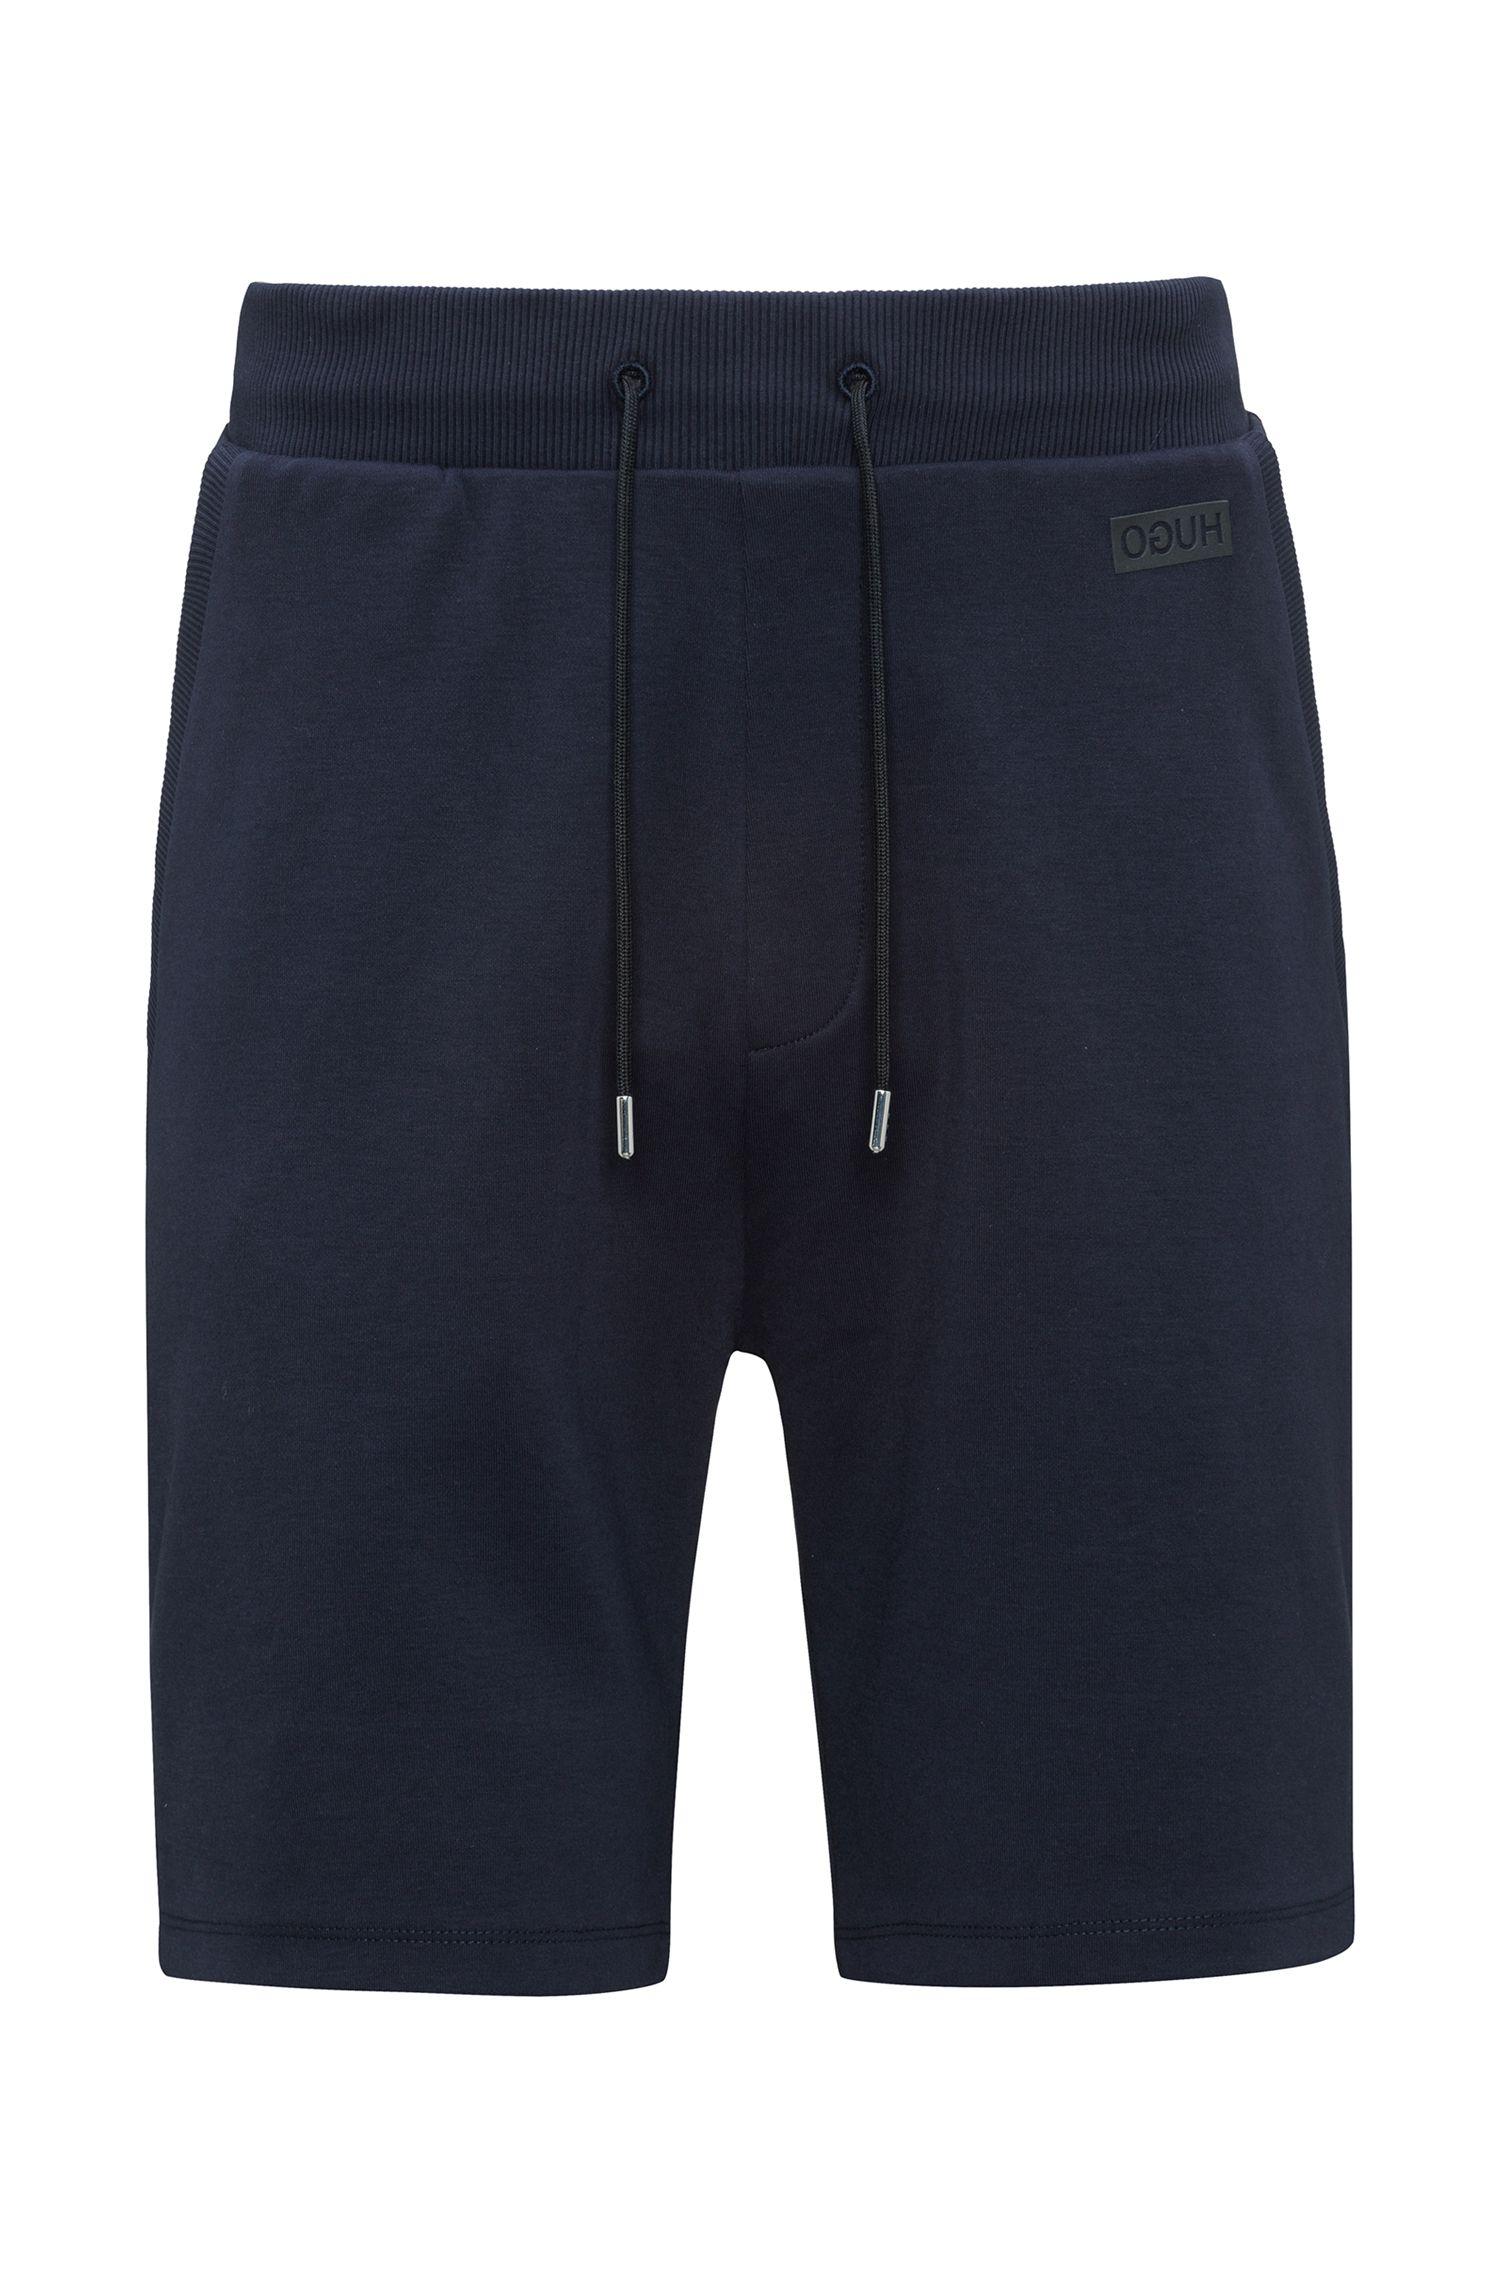 Drawstring shorts in interlock cotton